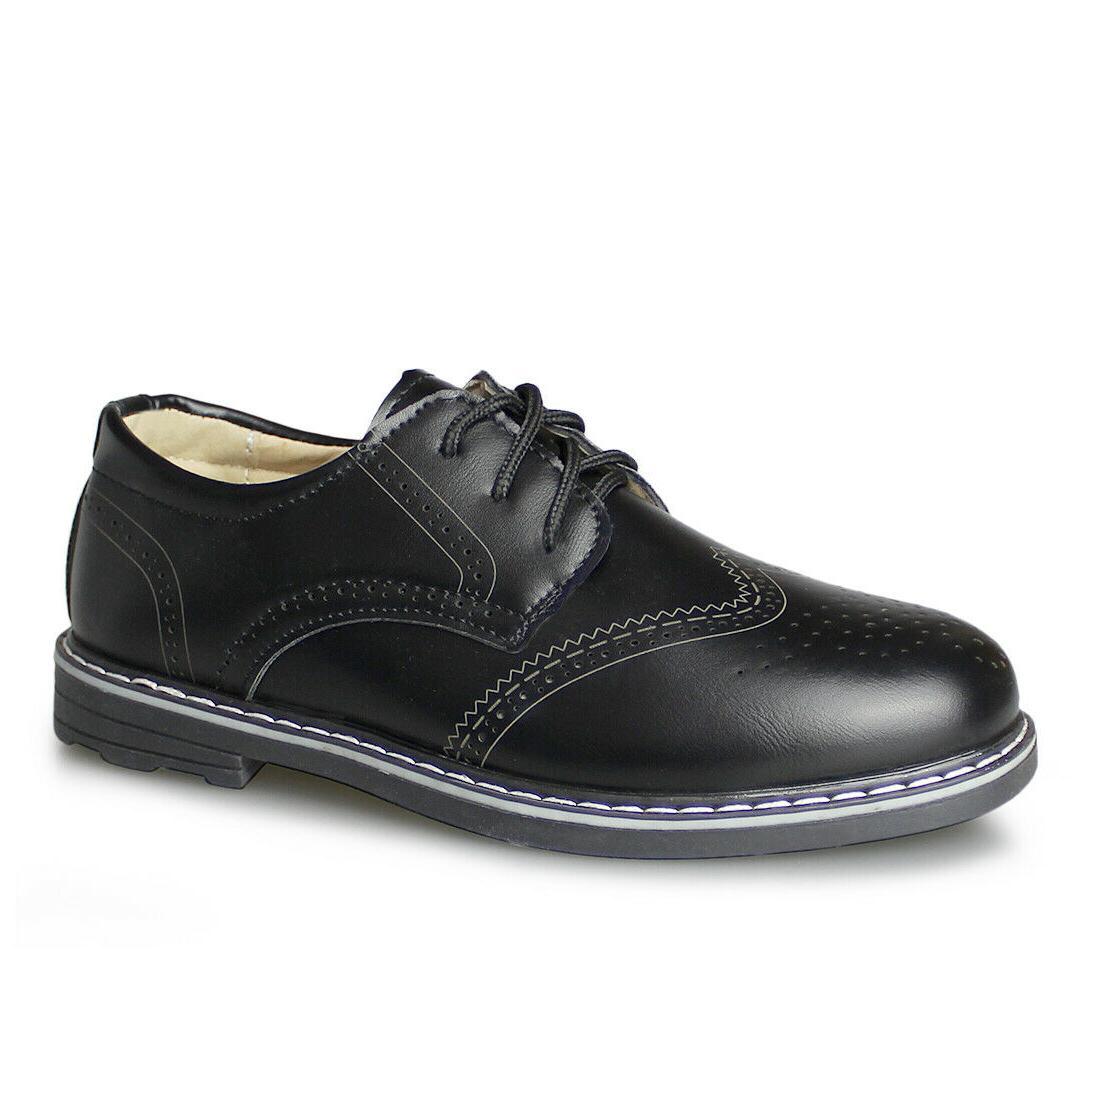 new boys brogue classic dress shoes black